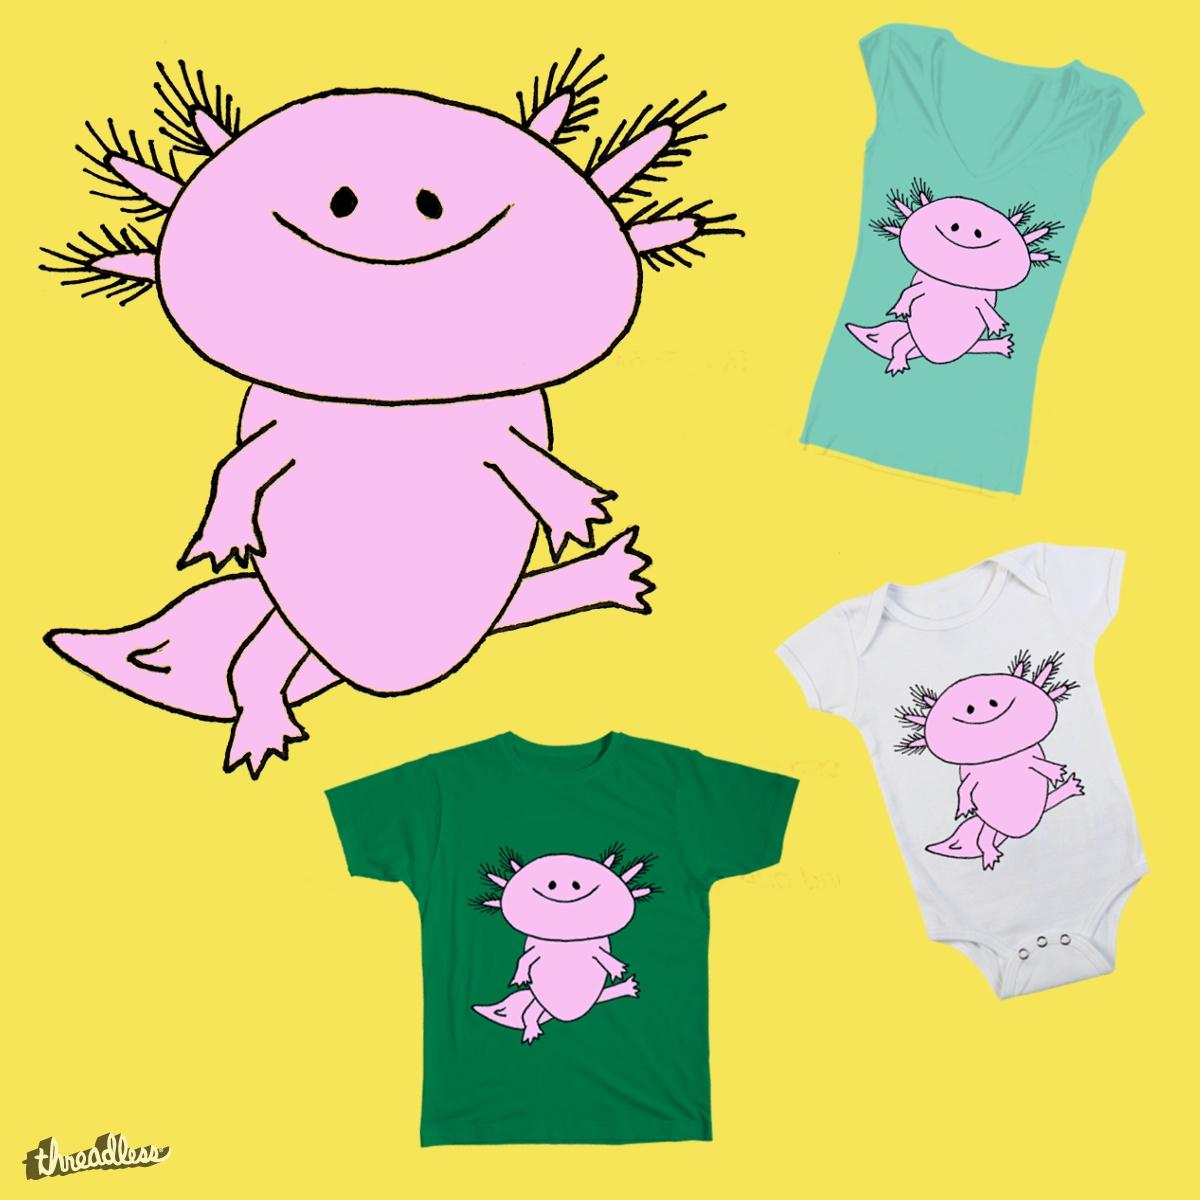 Dopey Axolotl by BlueOwl on Threadless